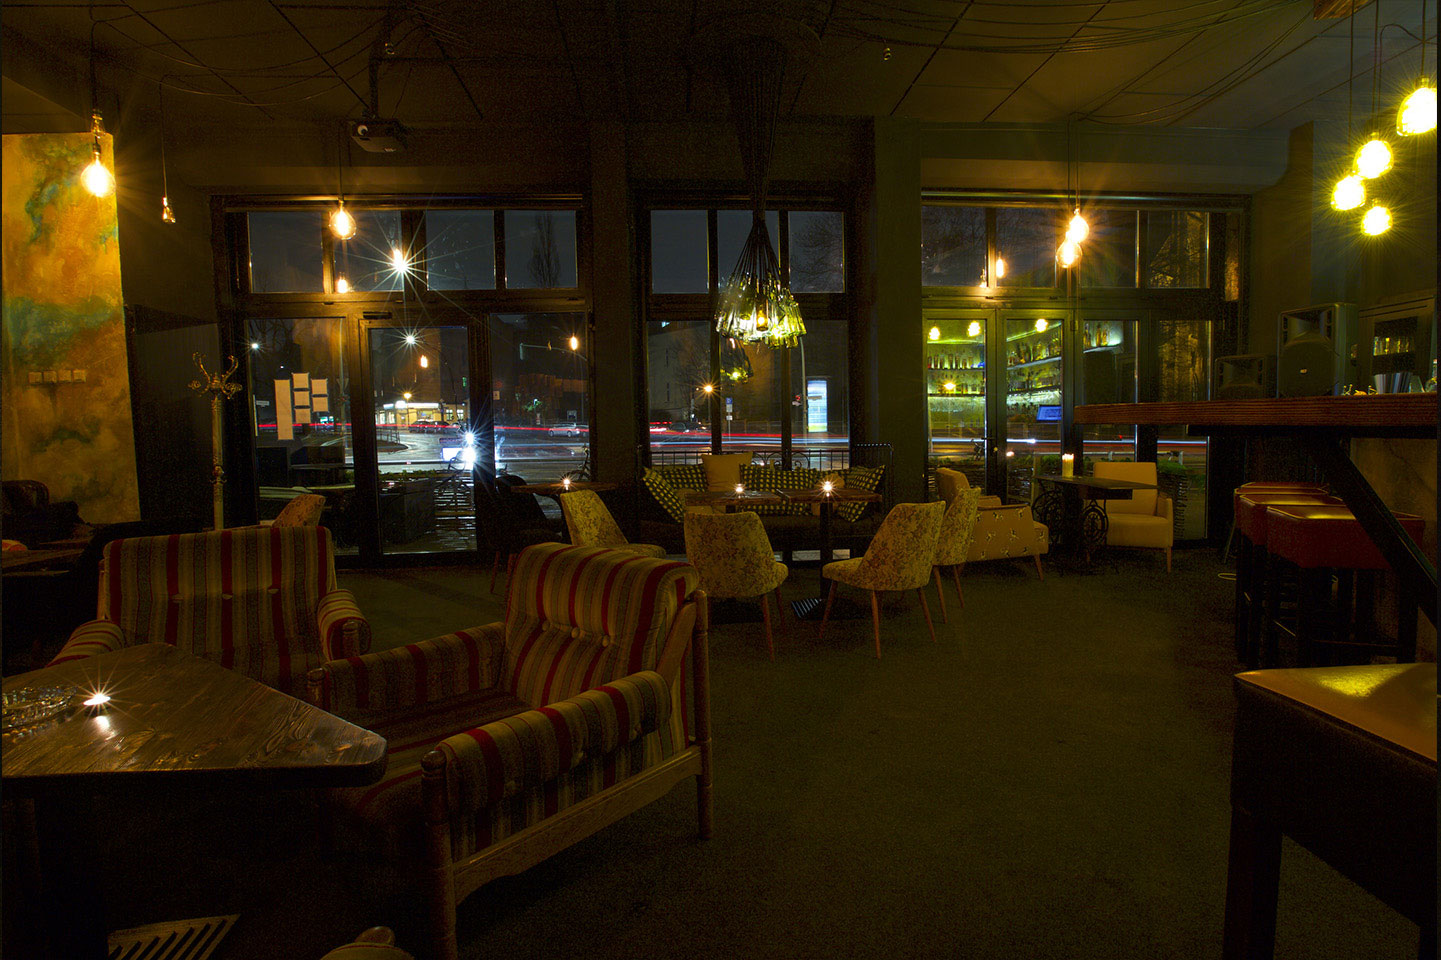 mowo bar cocktailbar shisha bar im herzen berlins. Black Bedroom Furniture Sets. Home Design Ideas